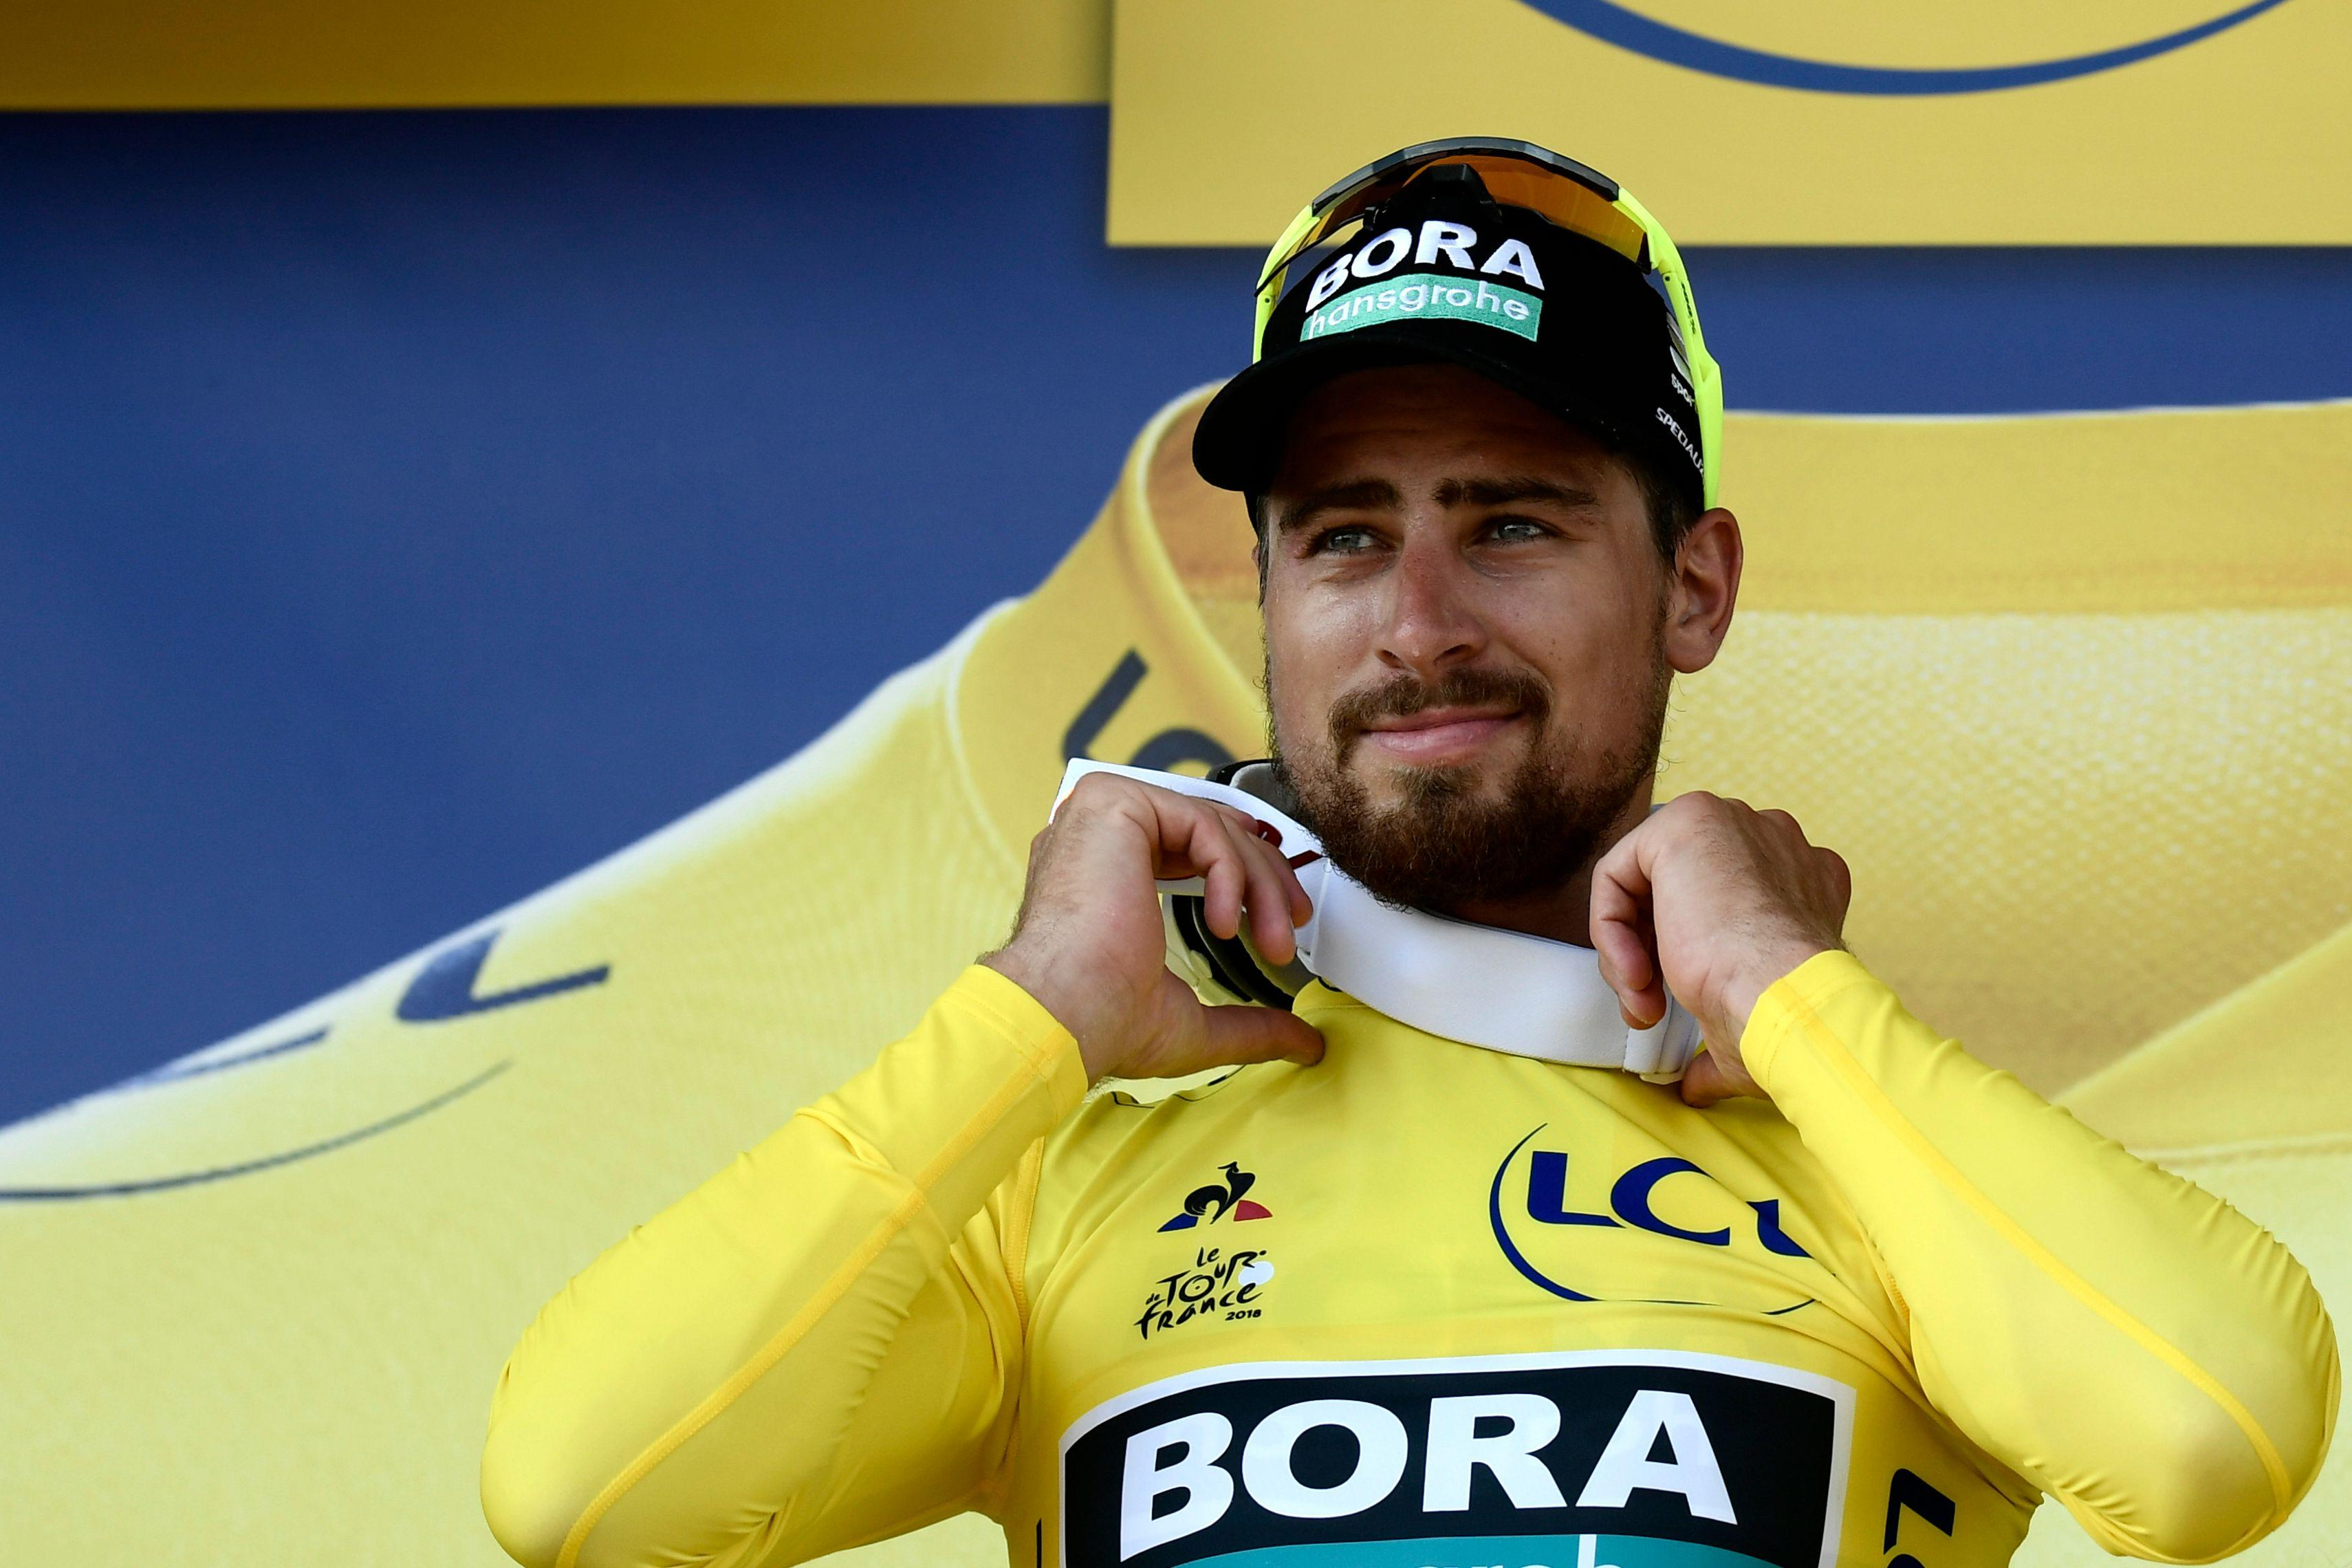 Slovakian superstar Sagan will wear the Yellow Jersey